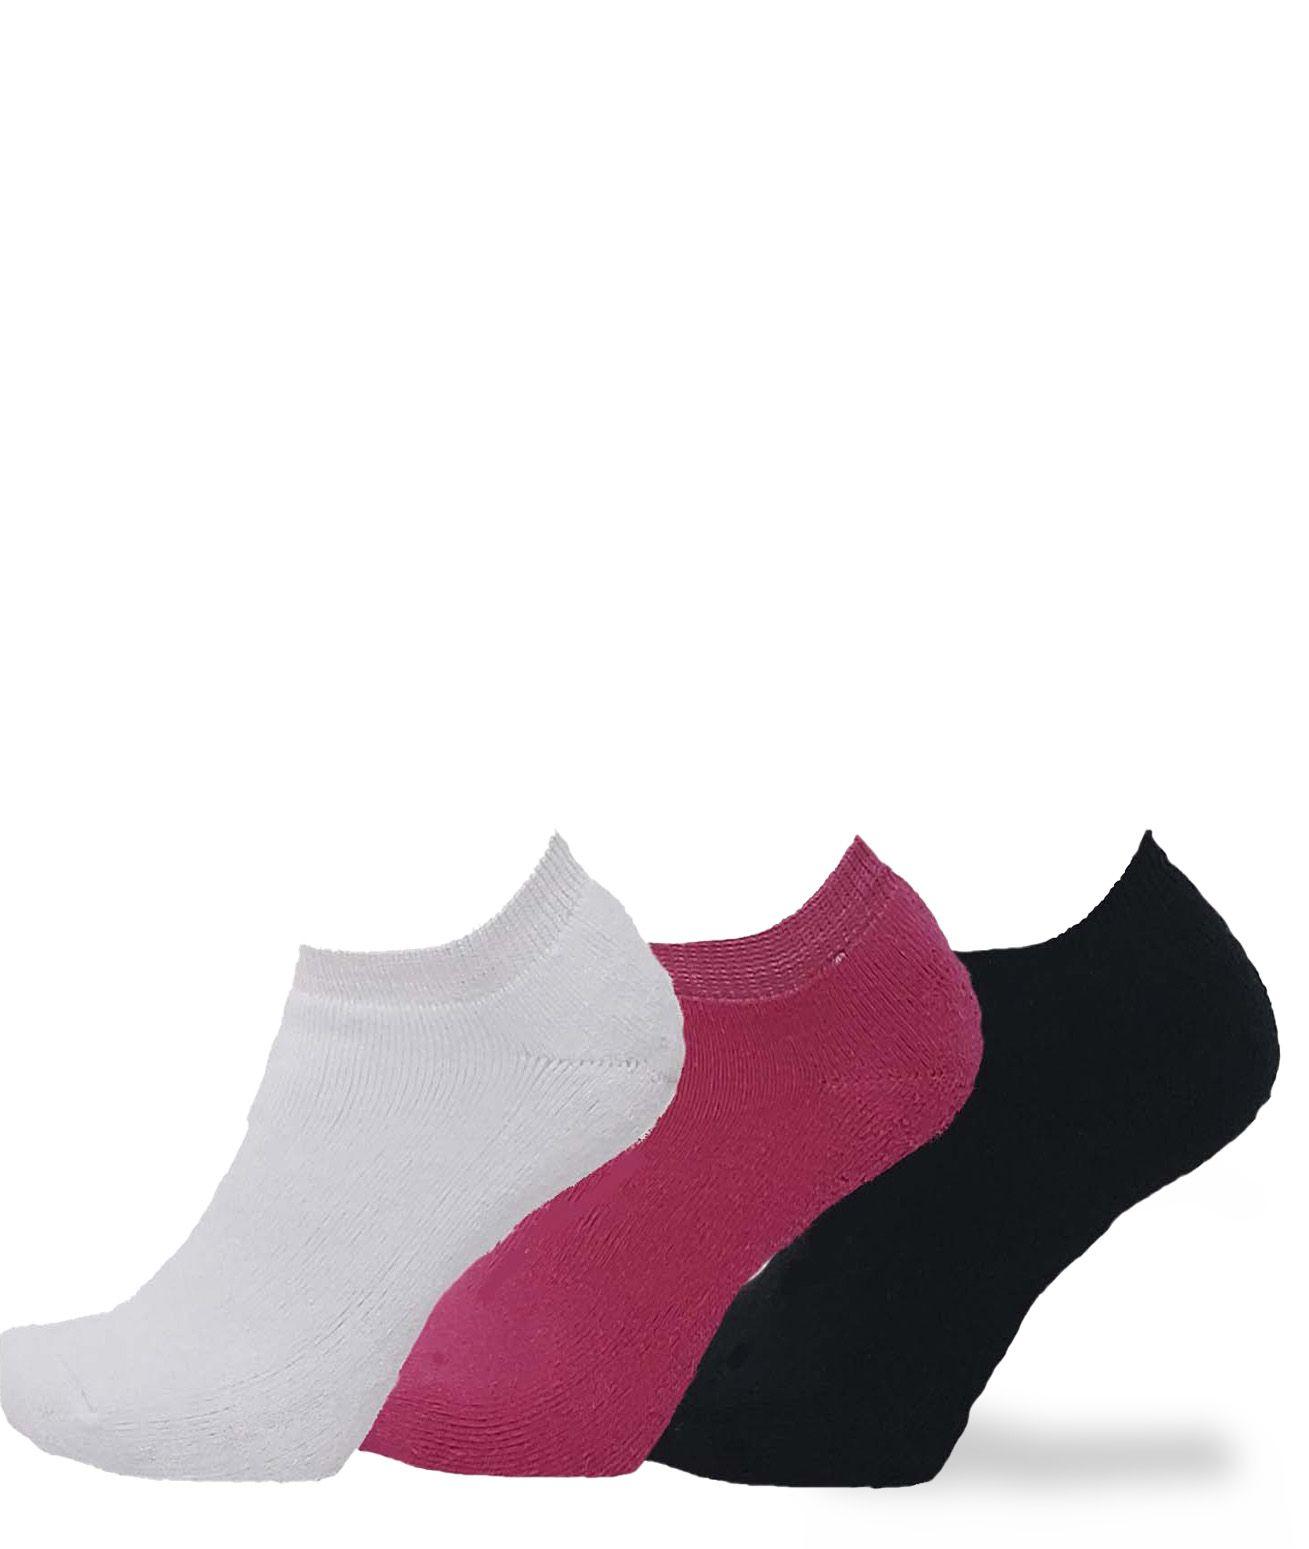 KIT COM 3 MEIAS SAPATILHAS FOOTLOOK 34/38